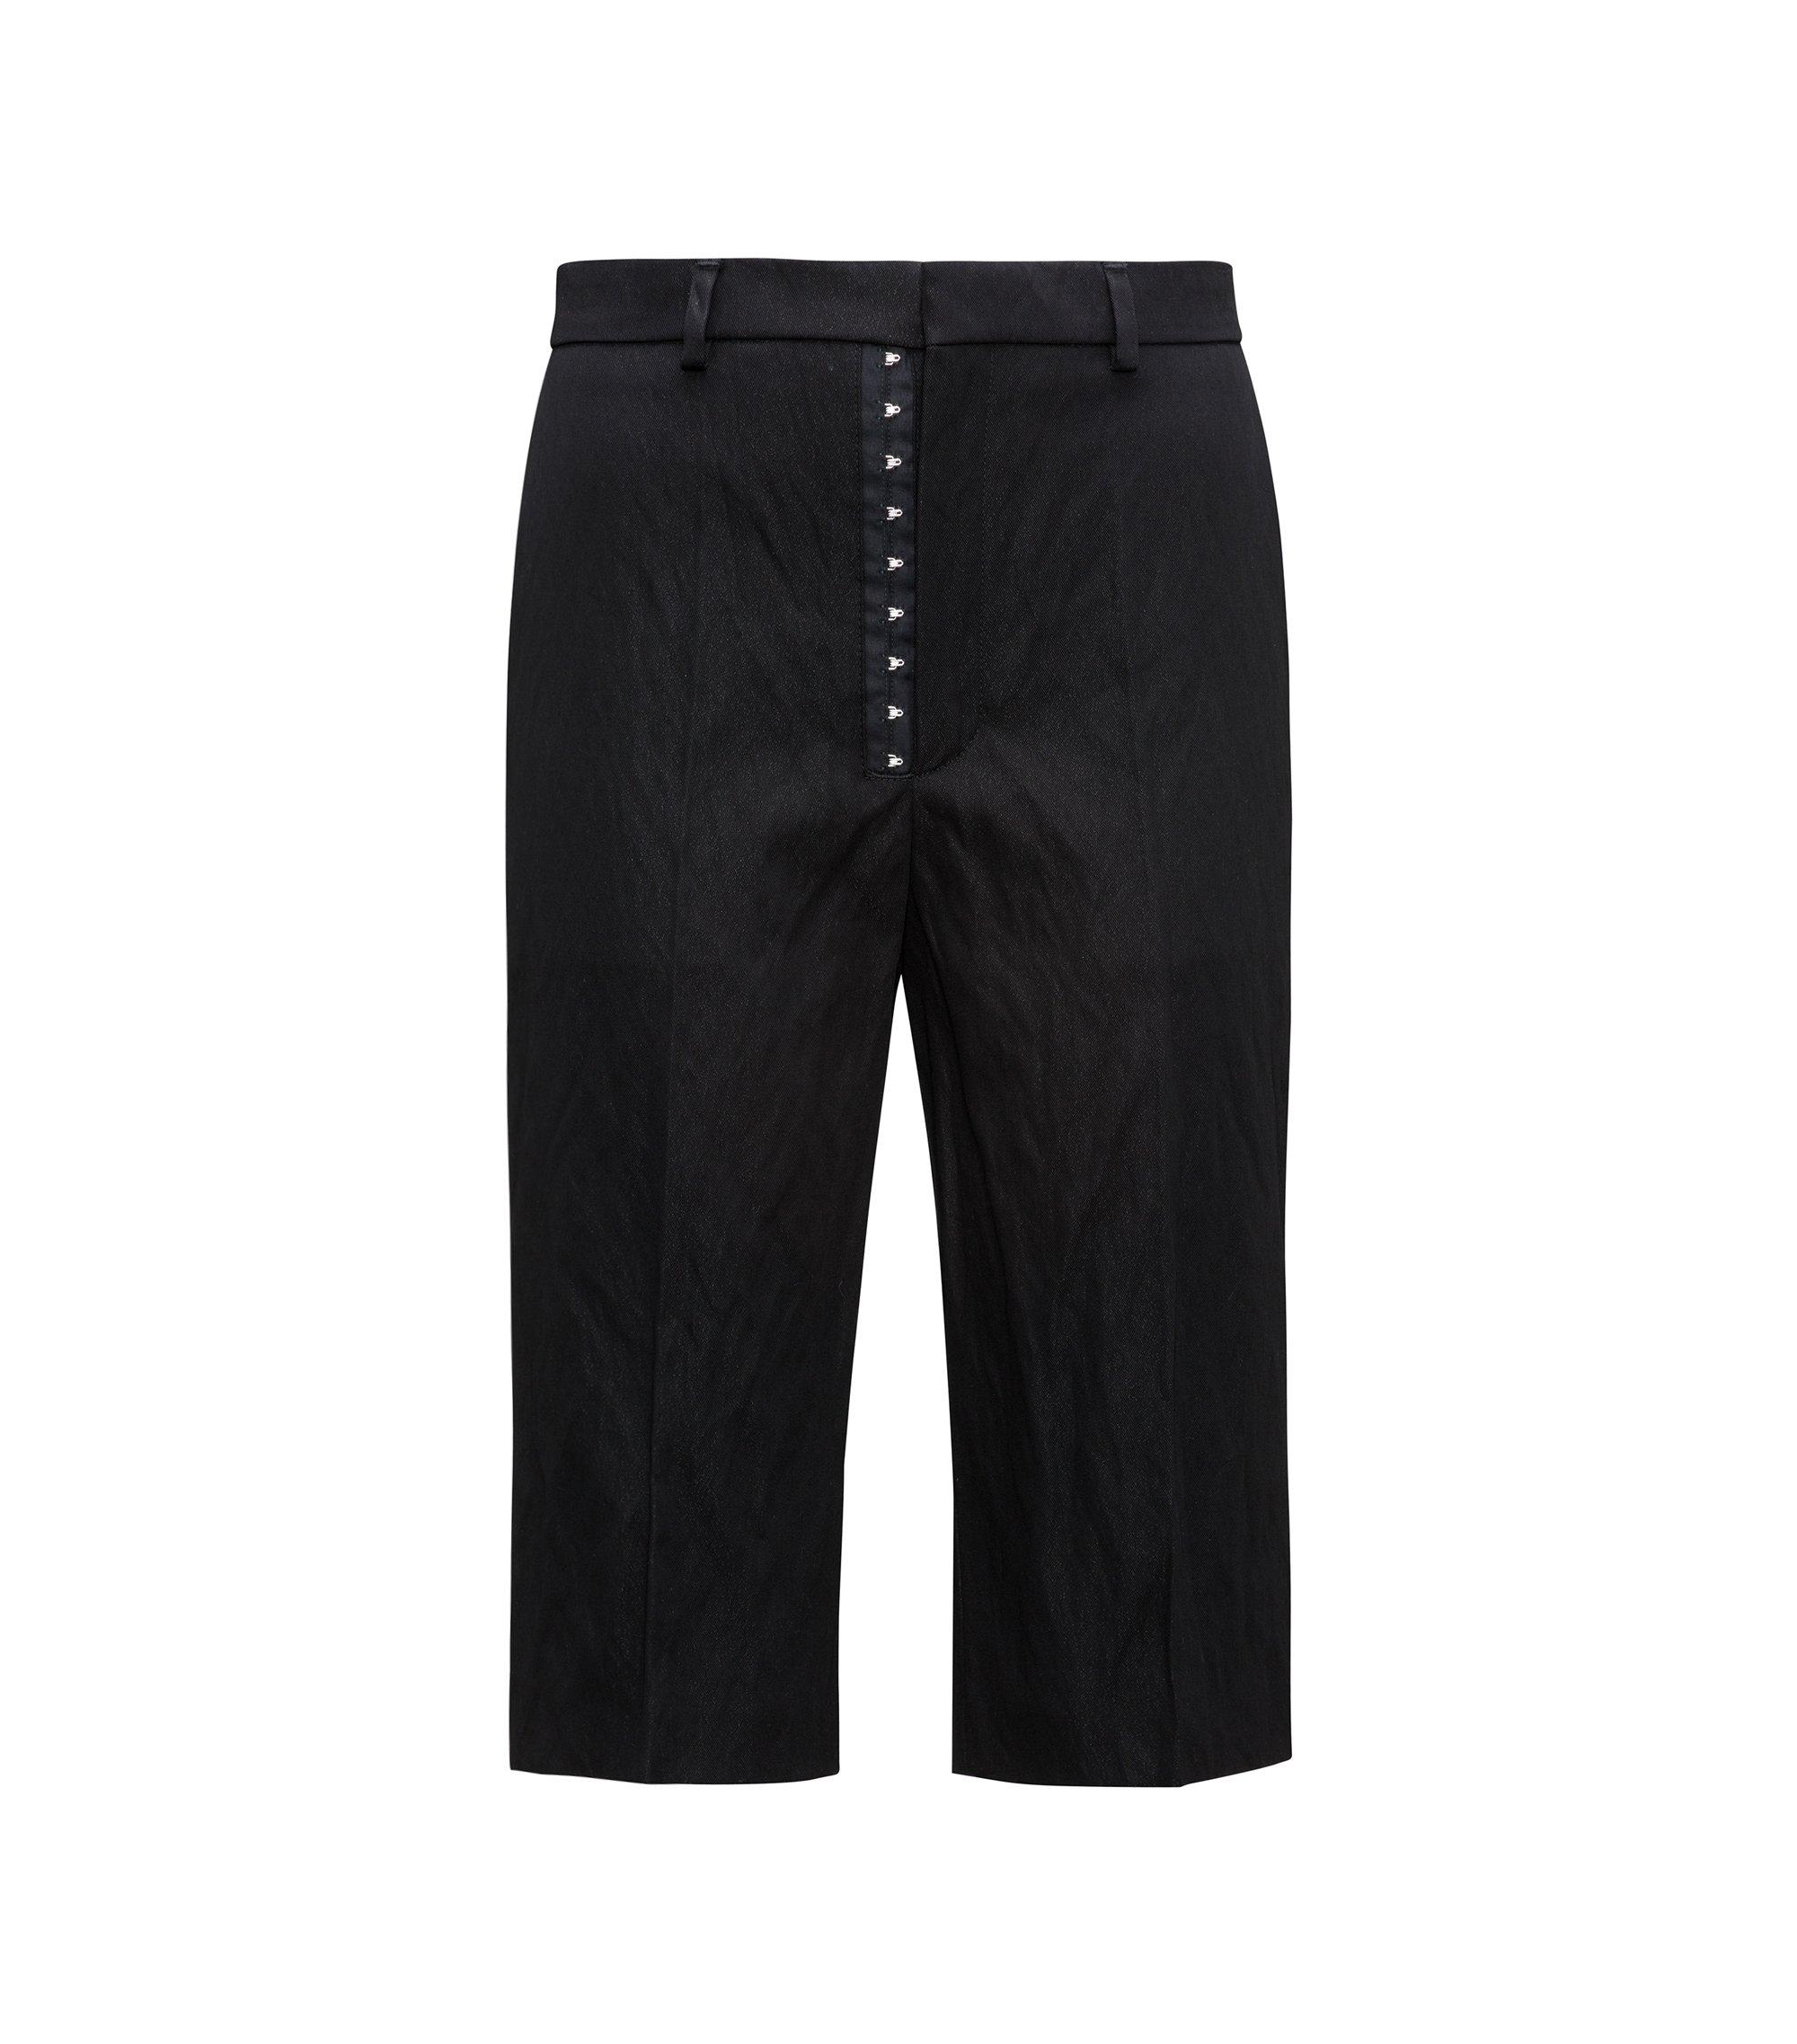 Cotton Blend Cropped Pant   Heralia FS, Black